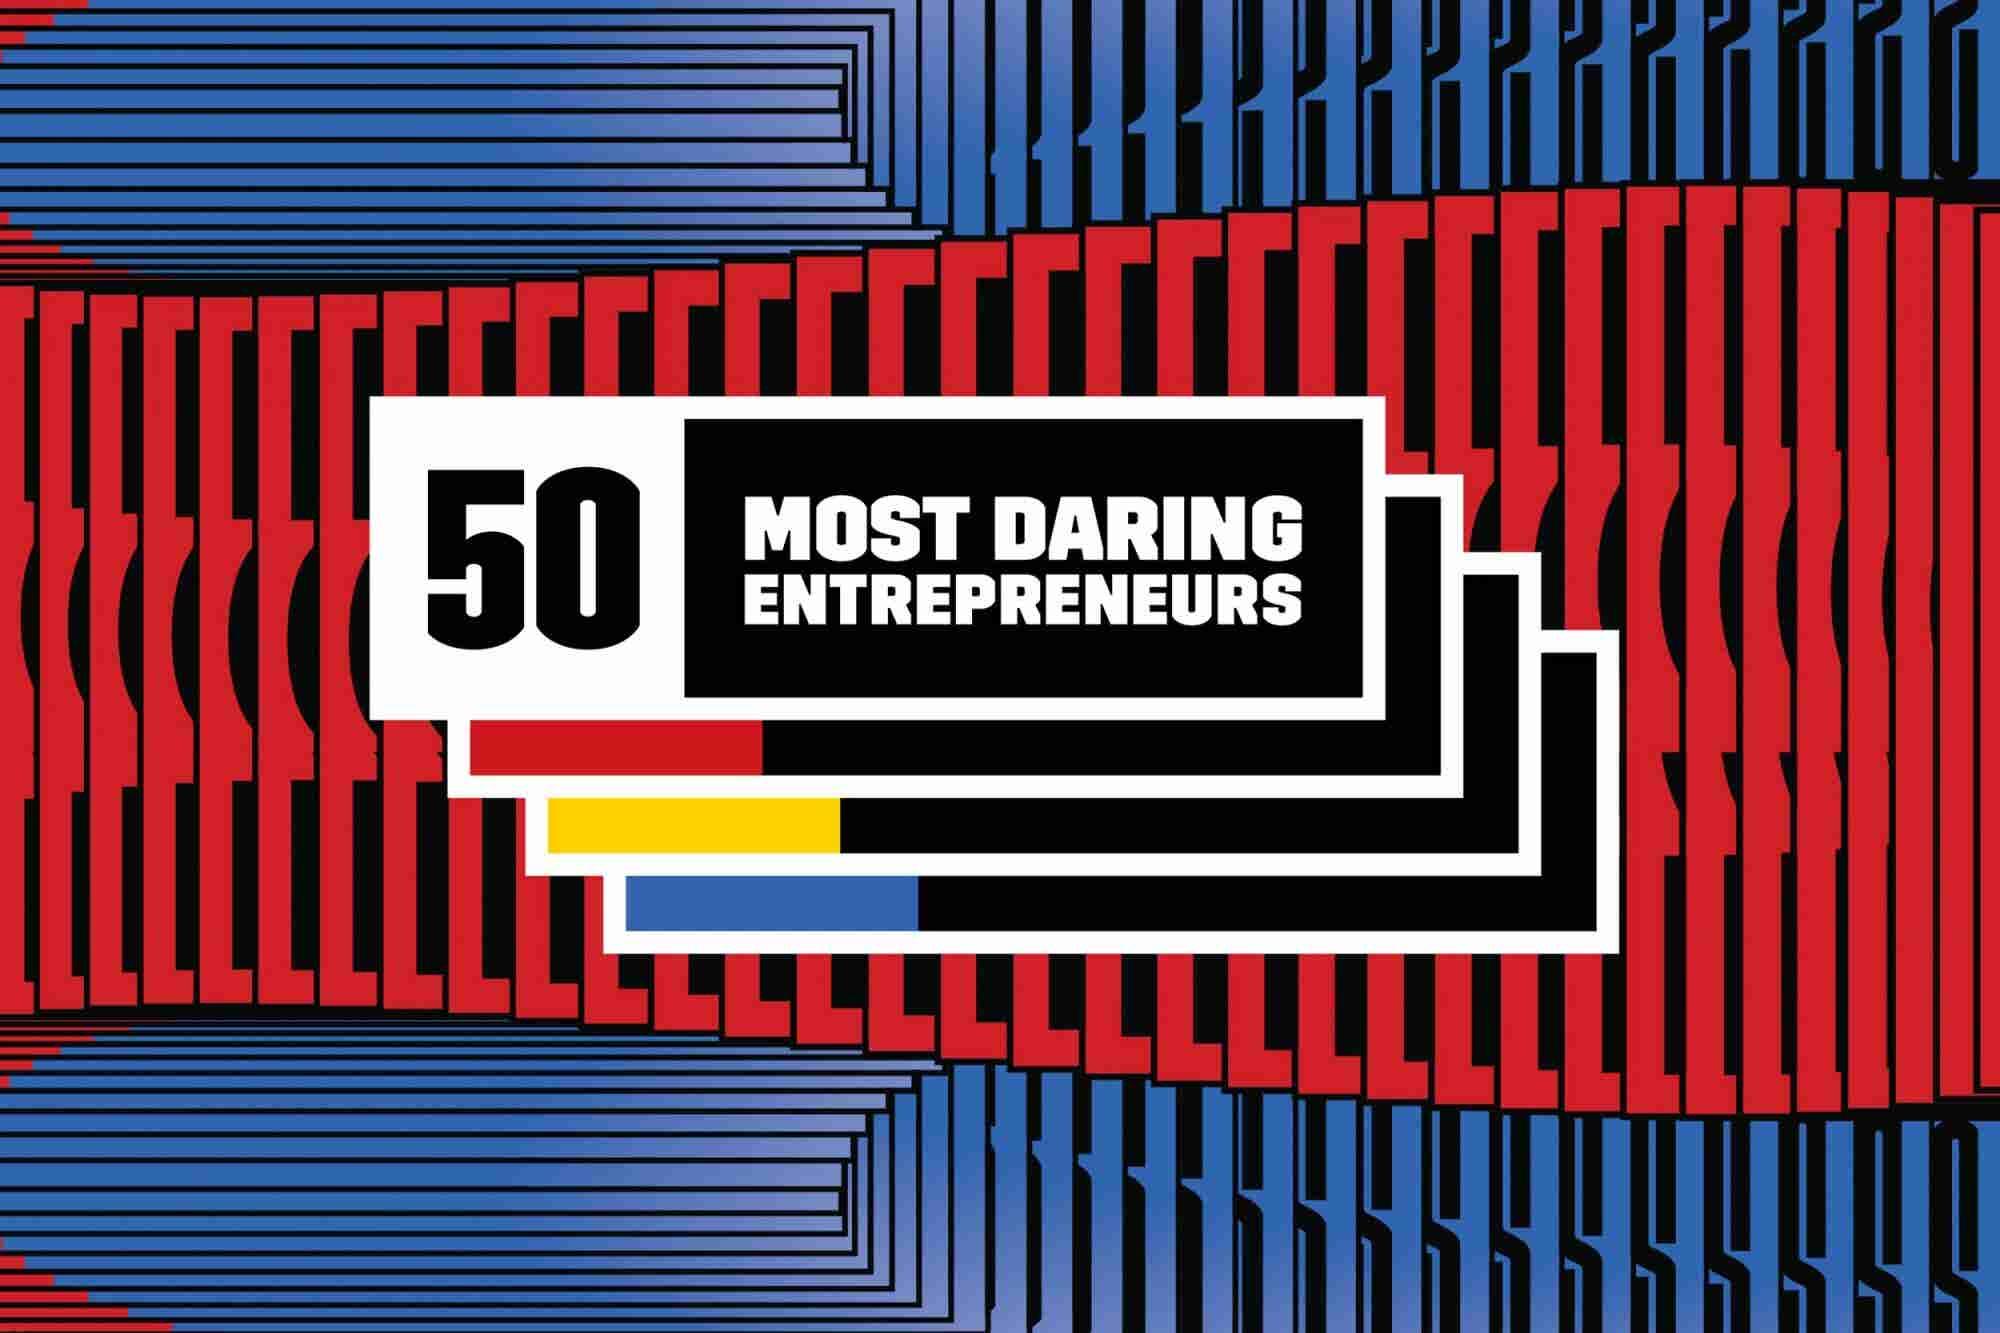 The 50 Most Daring Entrepreneurs in 2018